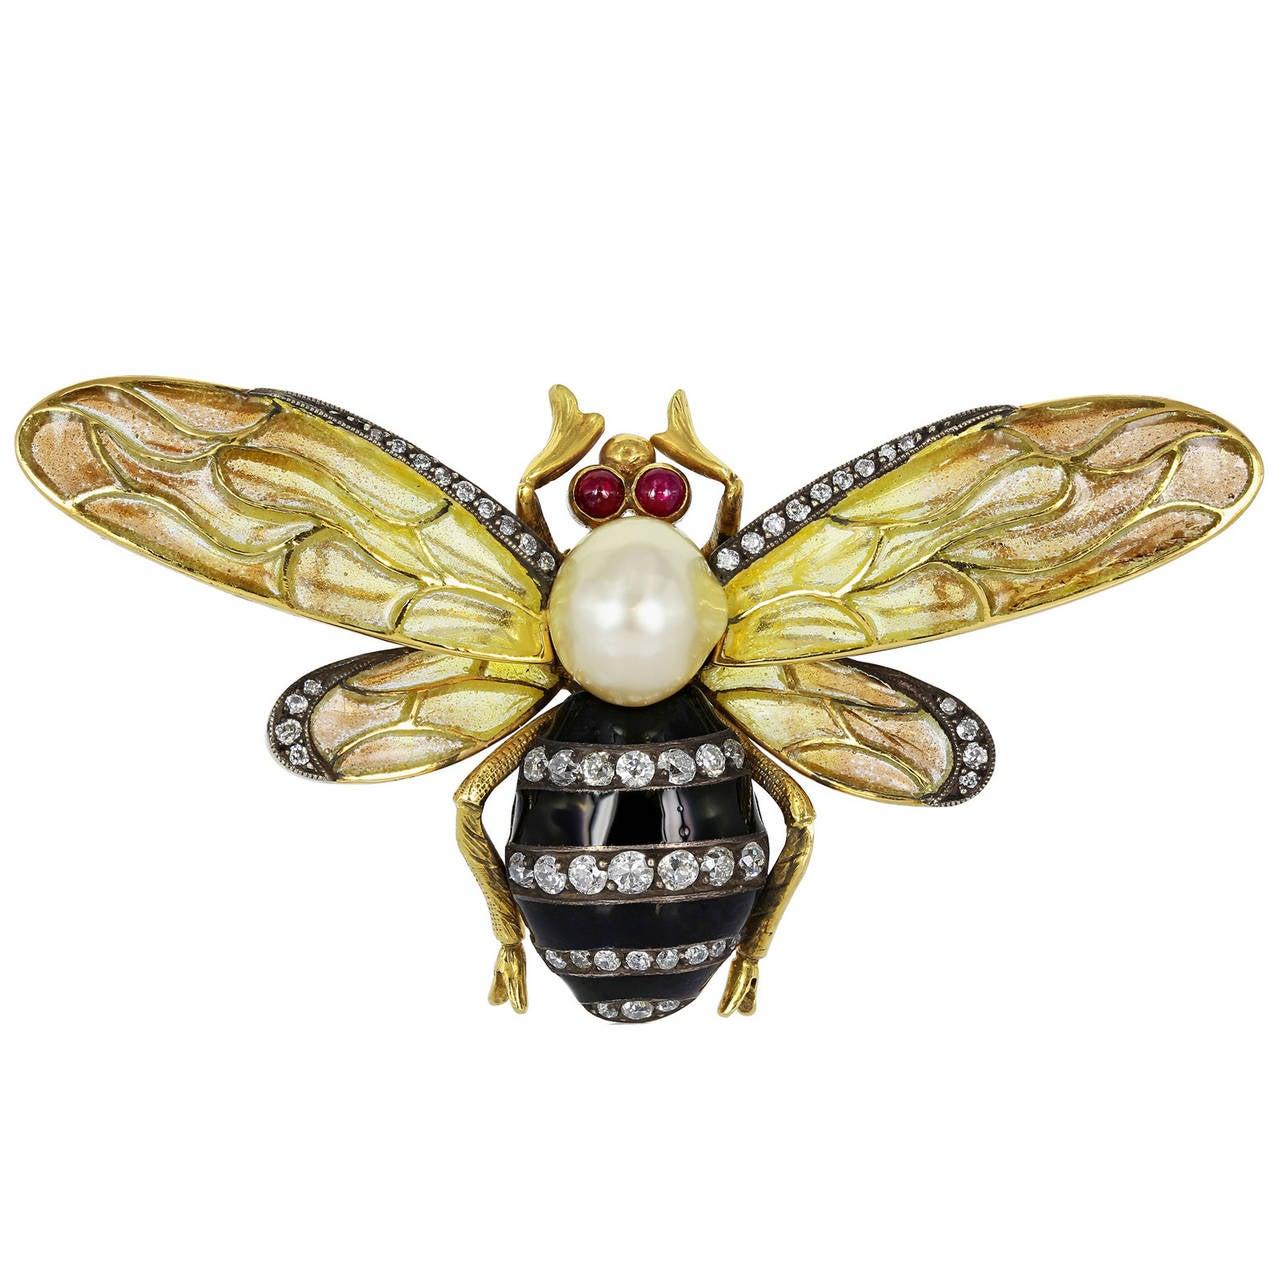 Plique-à-jour Pearl Diamond Gold Bumble Bee Brooch